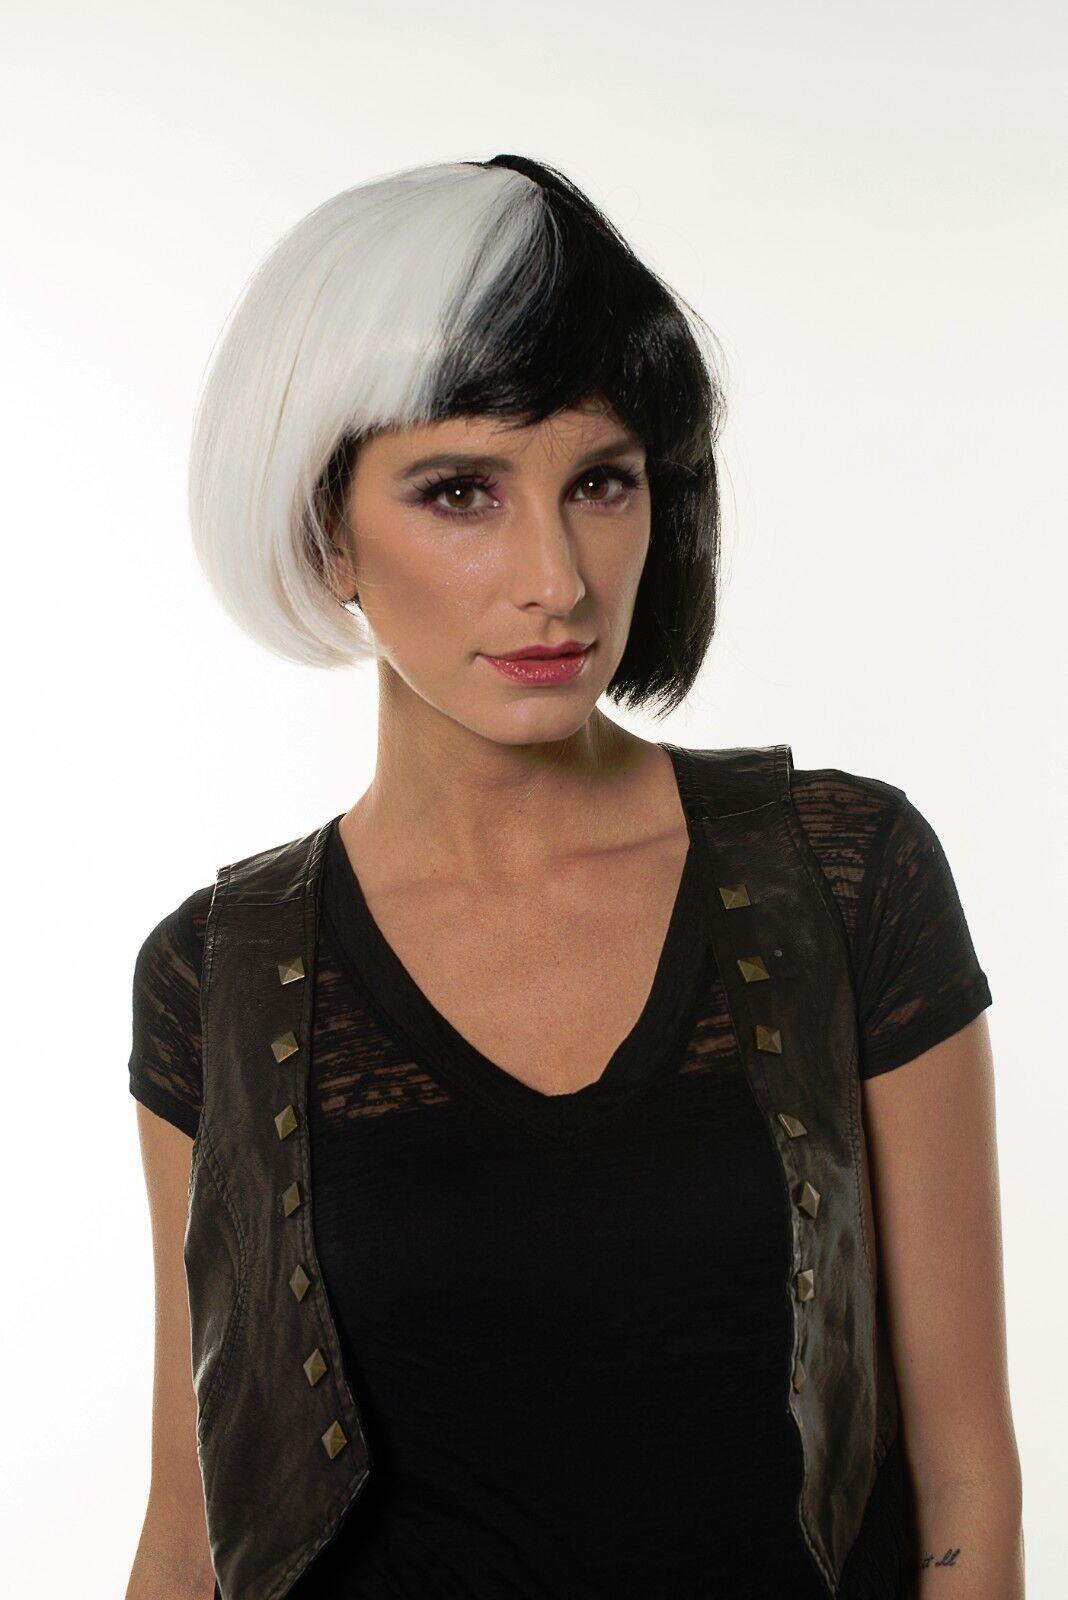 White Black Diva Wig 101 Dalmations Cruella De Vil Women Dr Black Jack H0288 adc8b0cc56